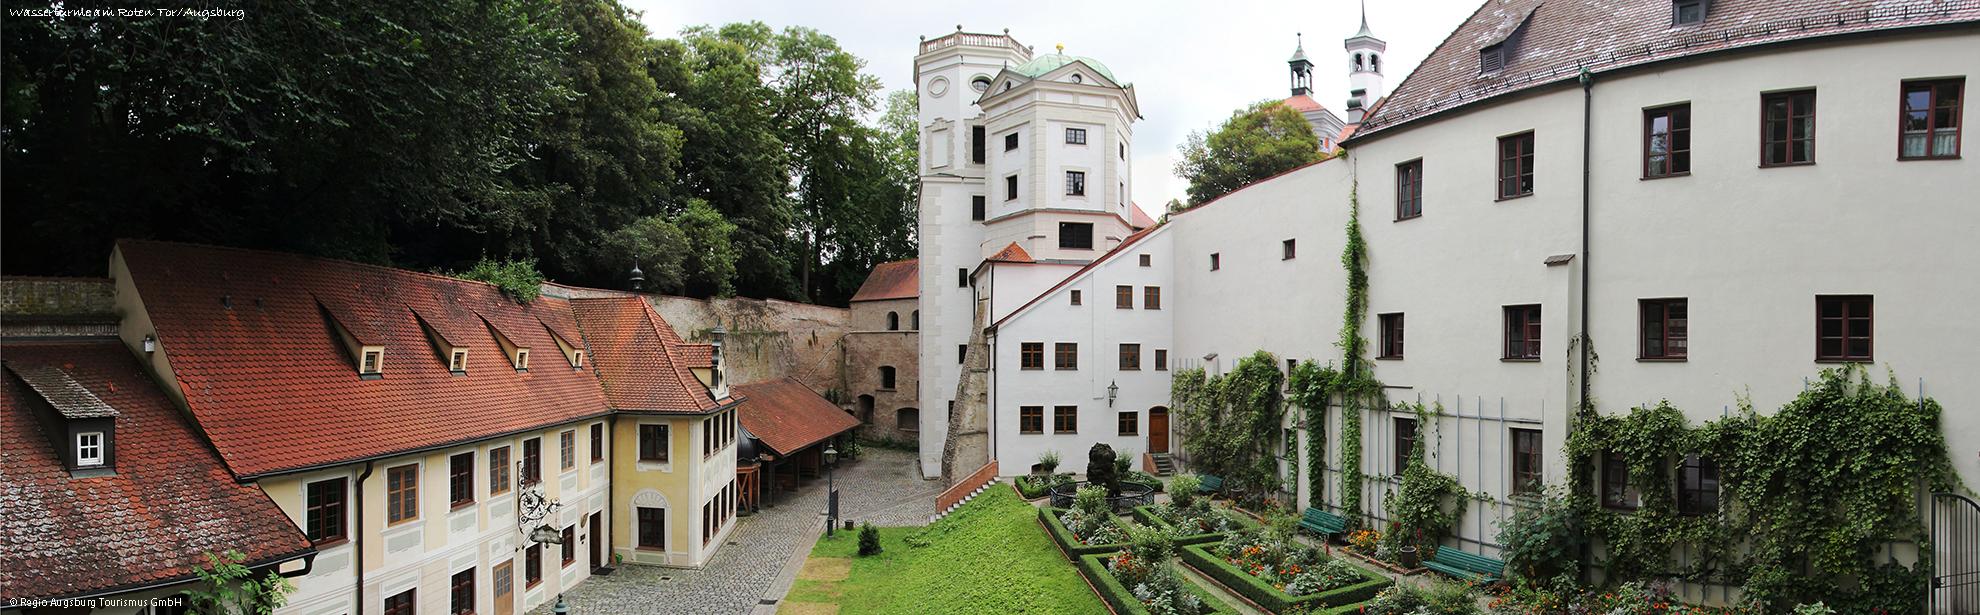 Oklass0134.0111_Regio-Augsburg-Tourismus_Wassertrme-Rotes-Tor_Augsburg